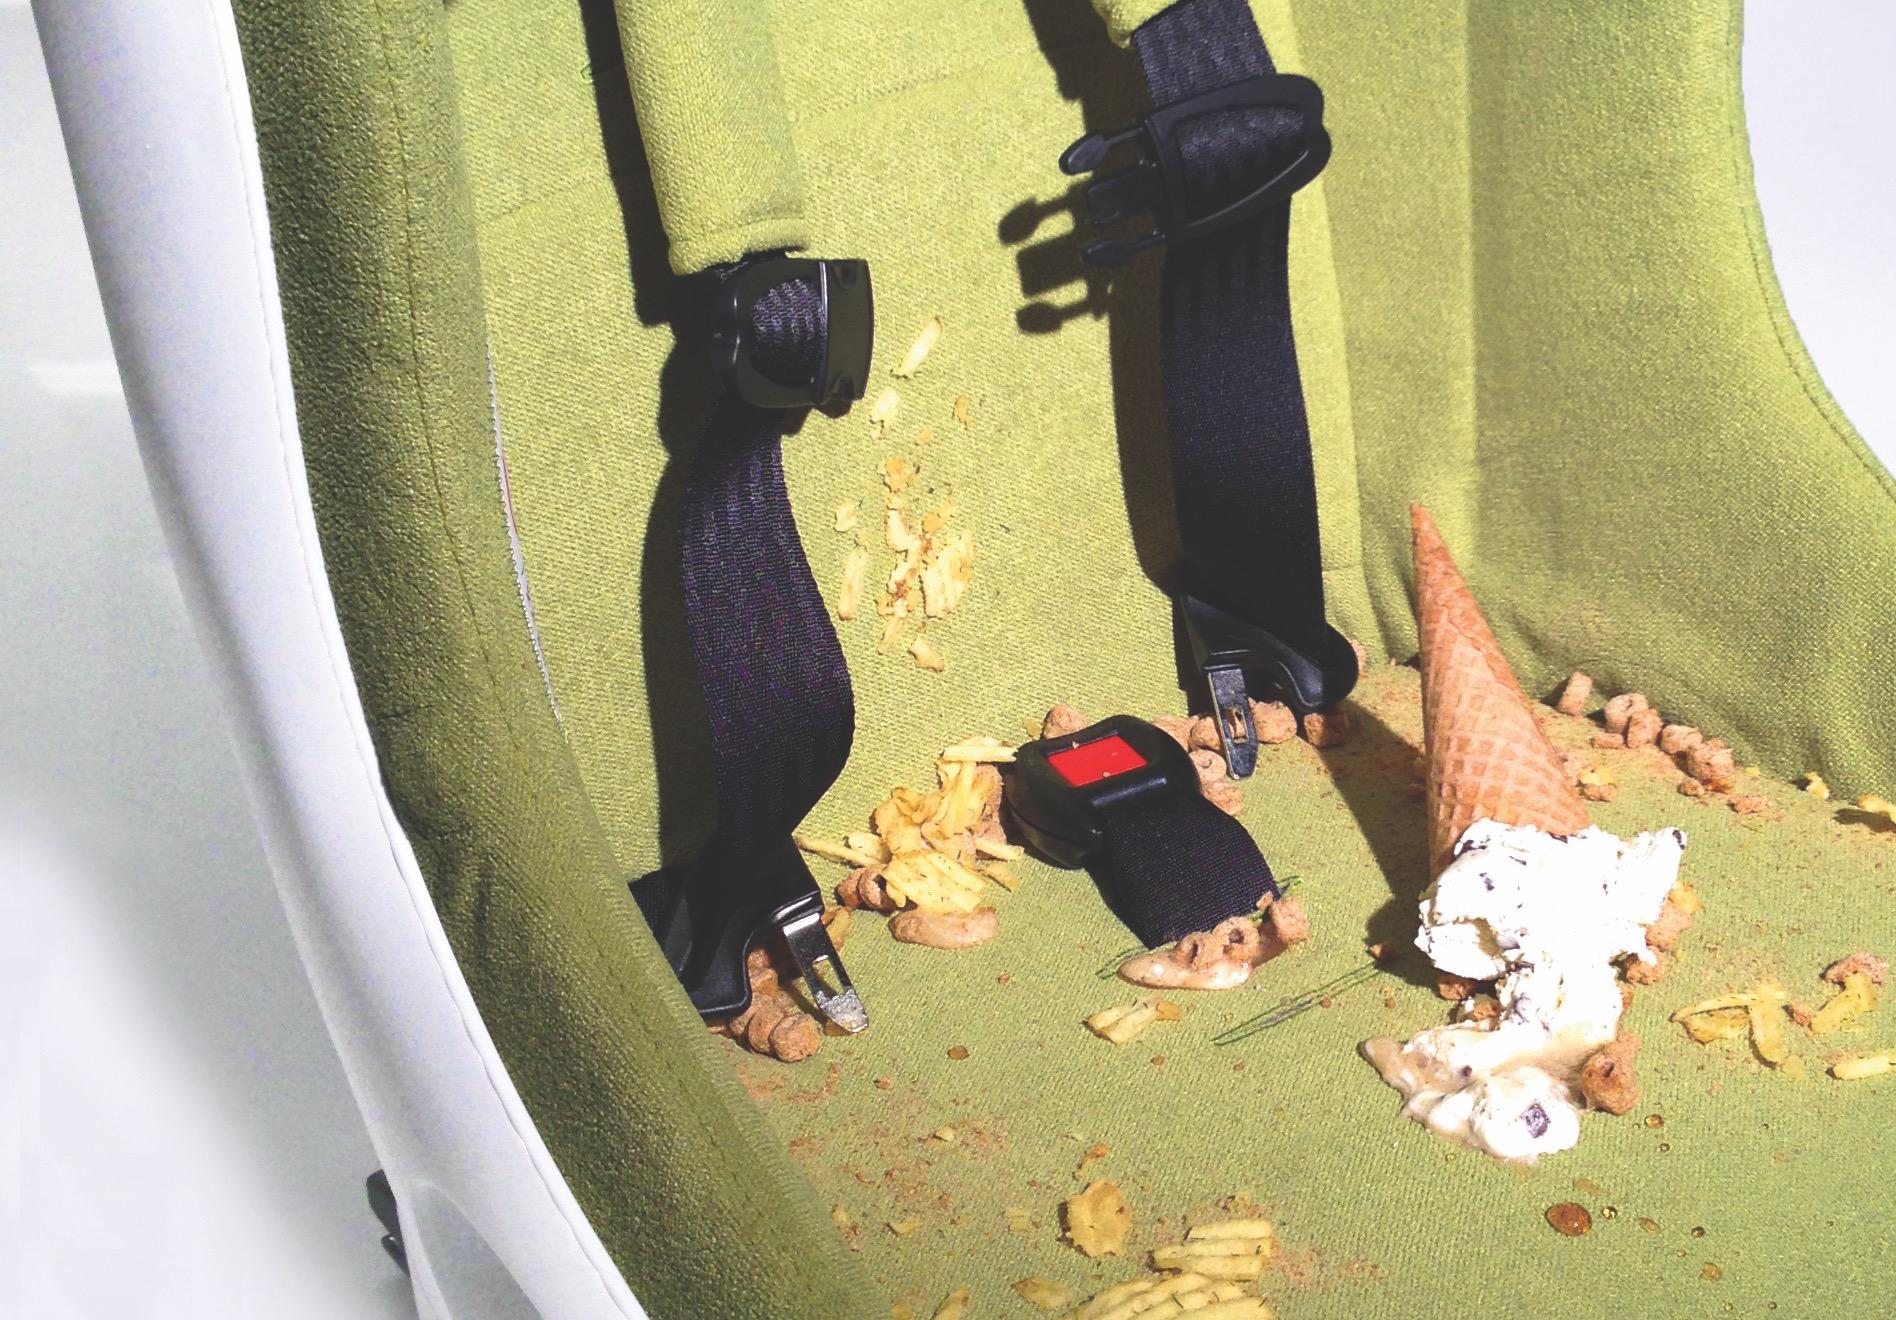 Car child seats dirtier than toilet seats garagevac for Garage cheminal seat feurs